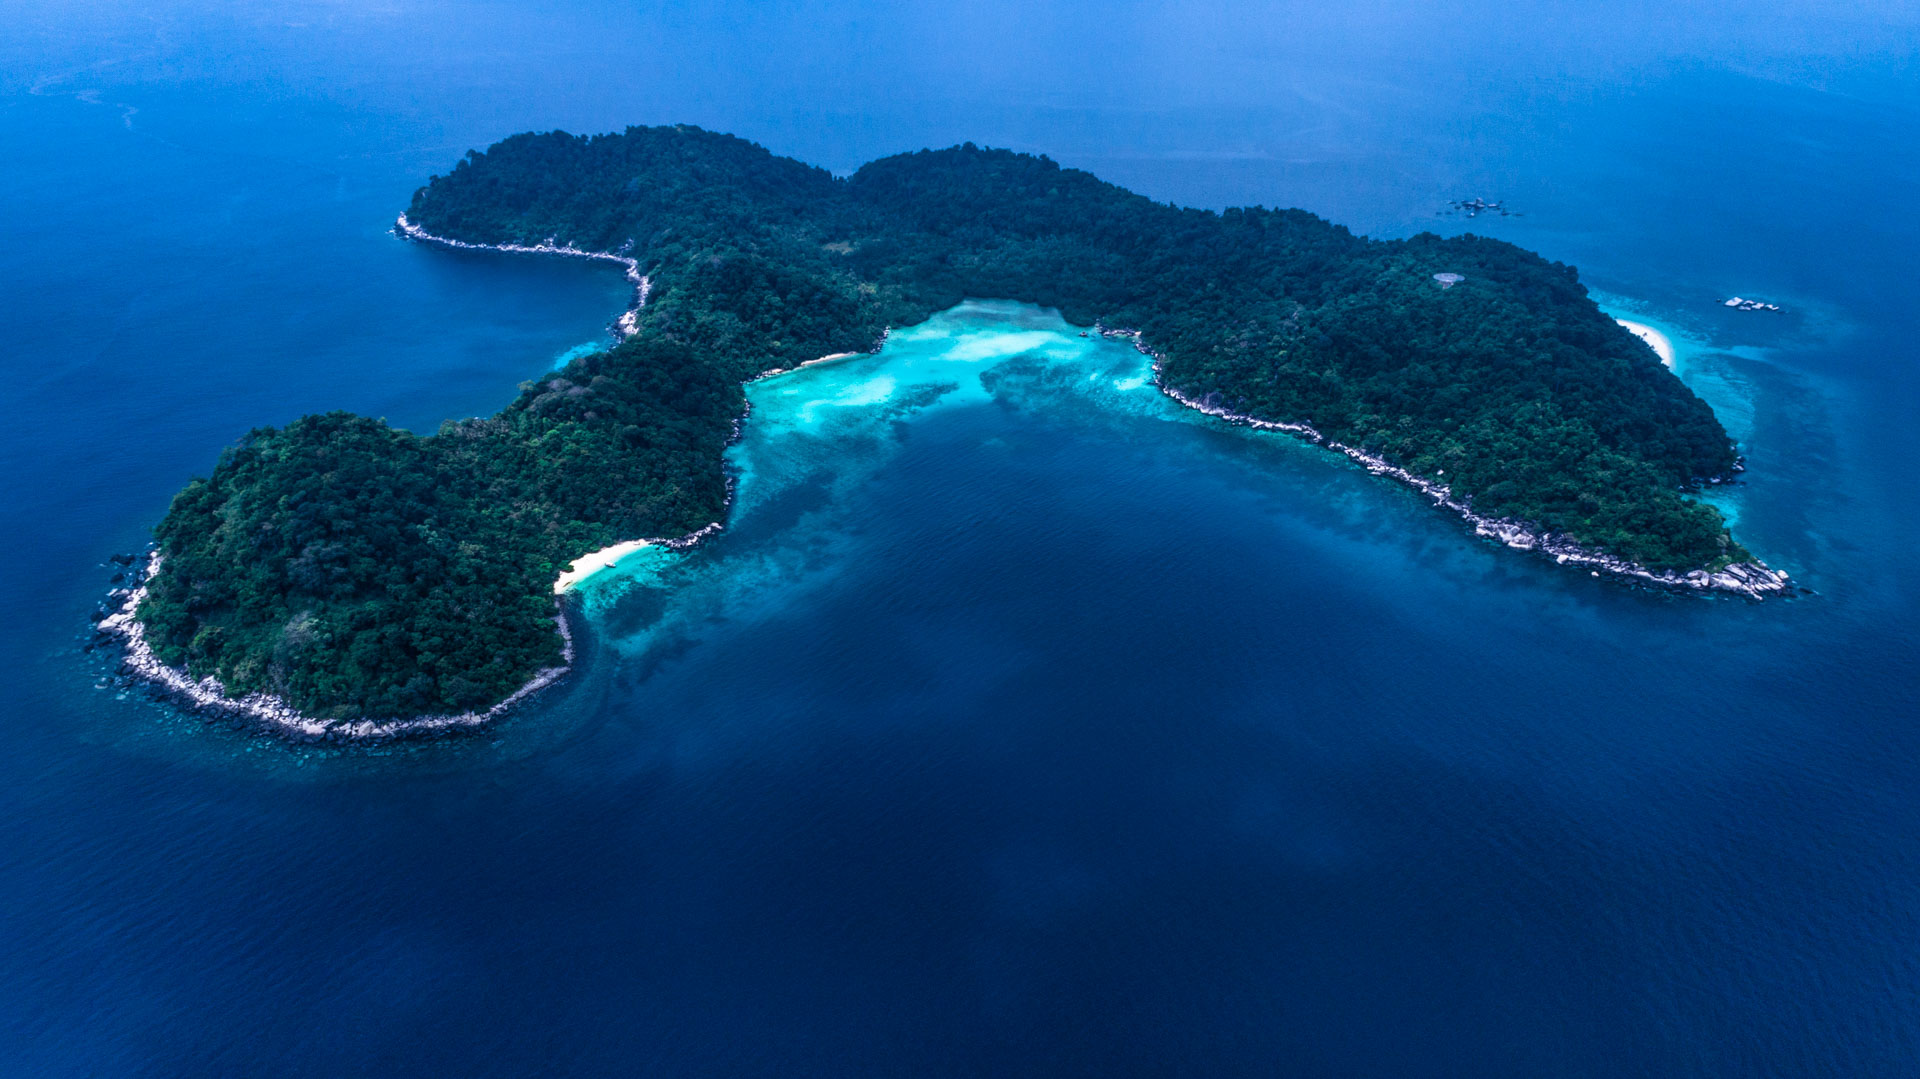 Tioman Island Malaysia Pescart Travel Photo Blog Enrico Pescantini Coral Island aerial view drone